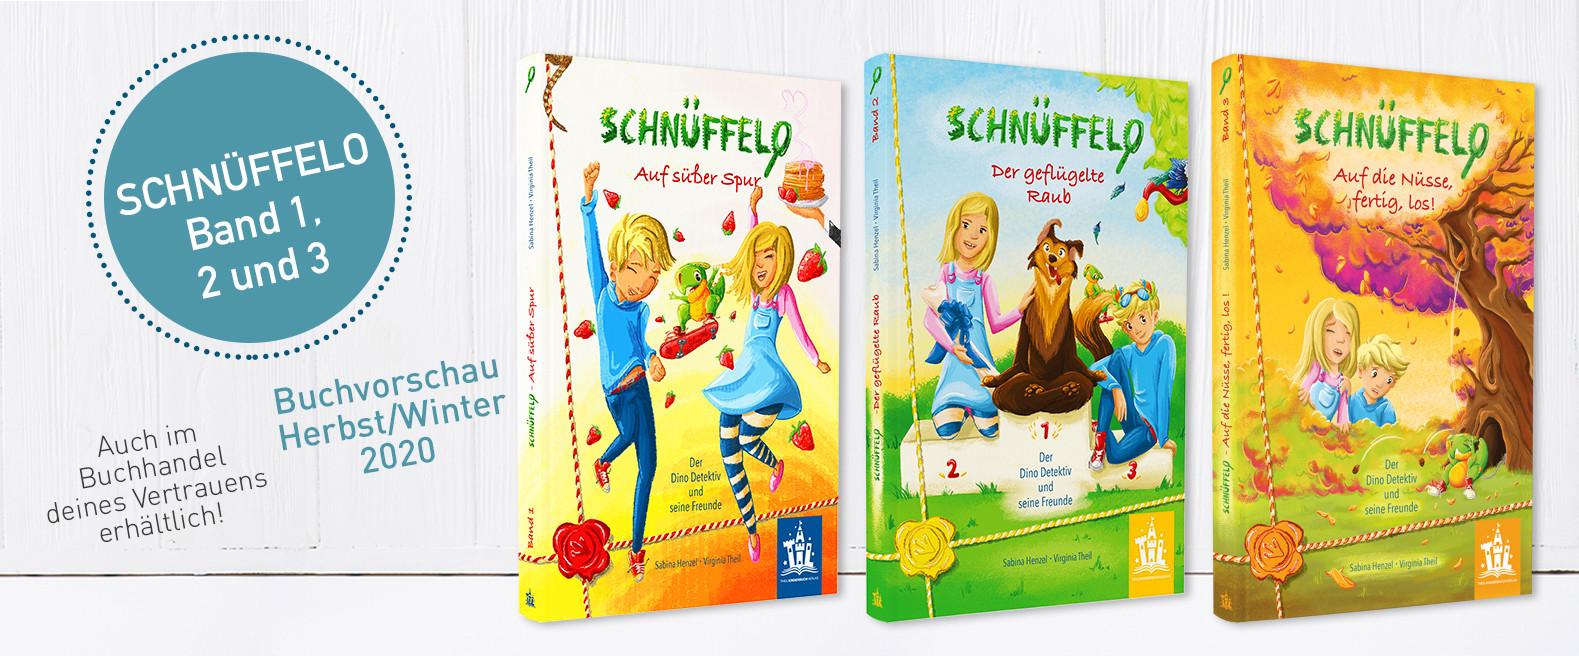 Slife-Show-Schnueffelo1,2u3.jpg